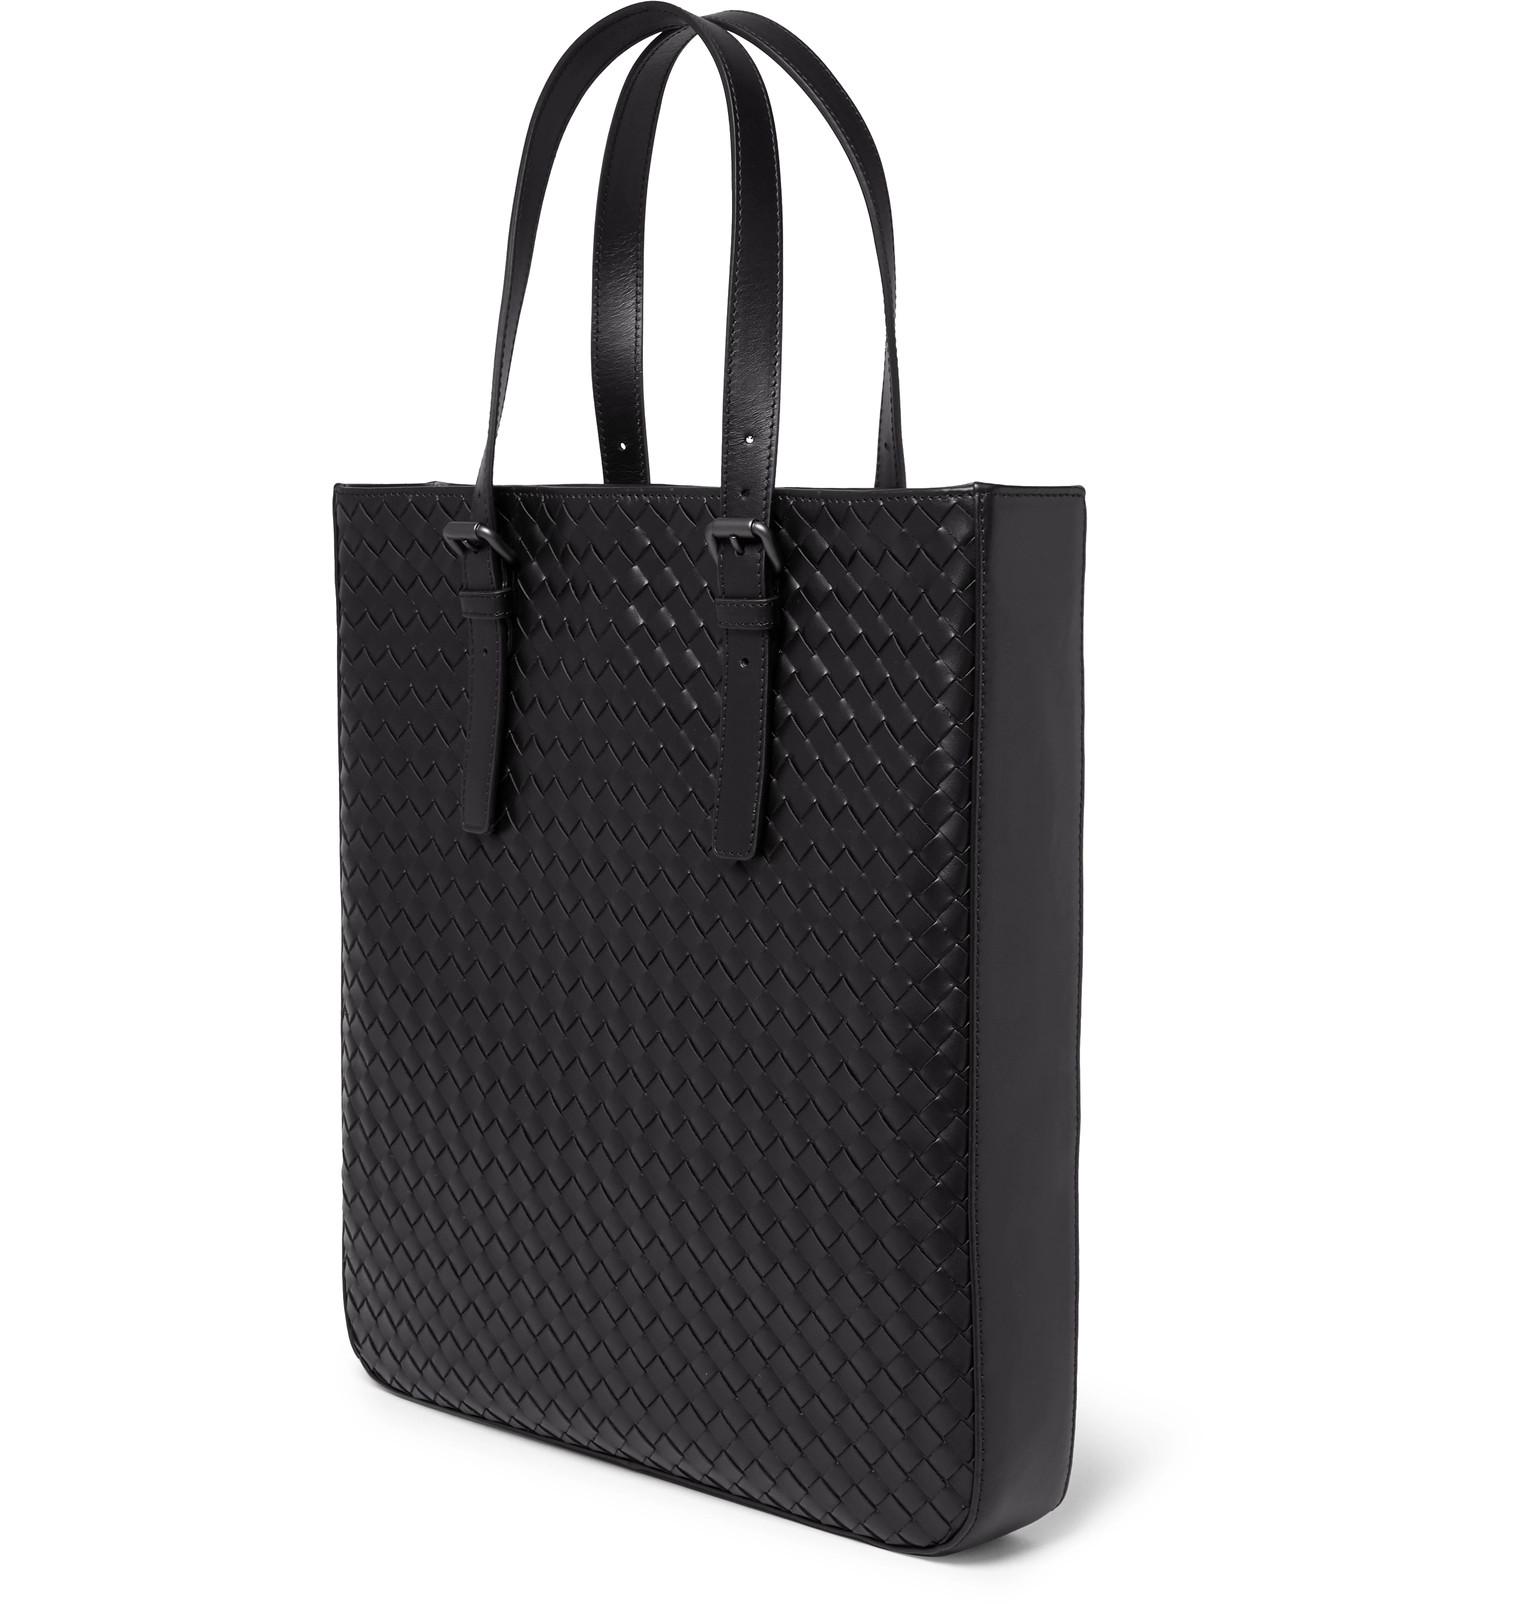 63dc836876 Bottega Veneta - Intrecciato Leather Tote Bag